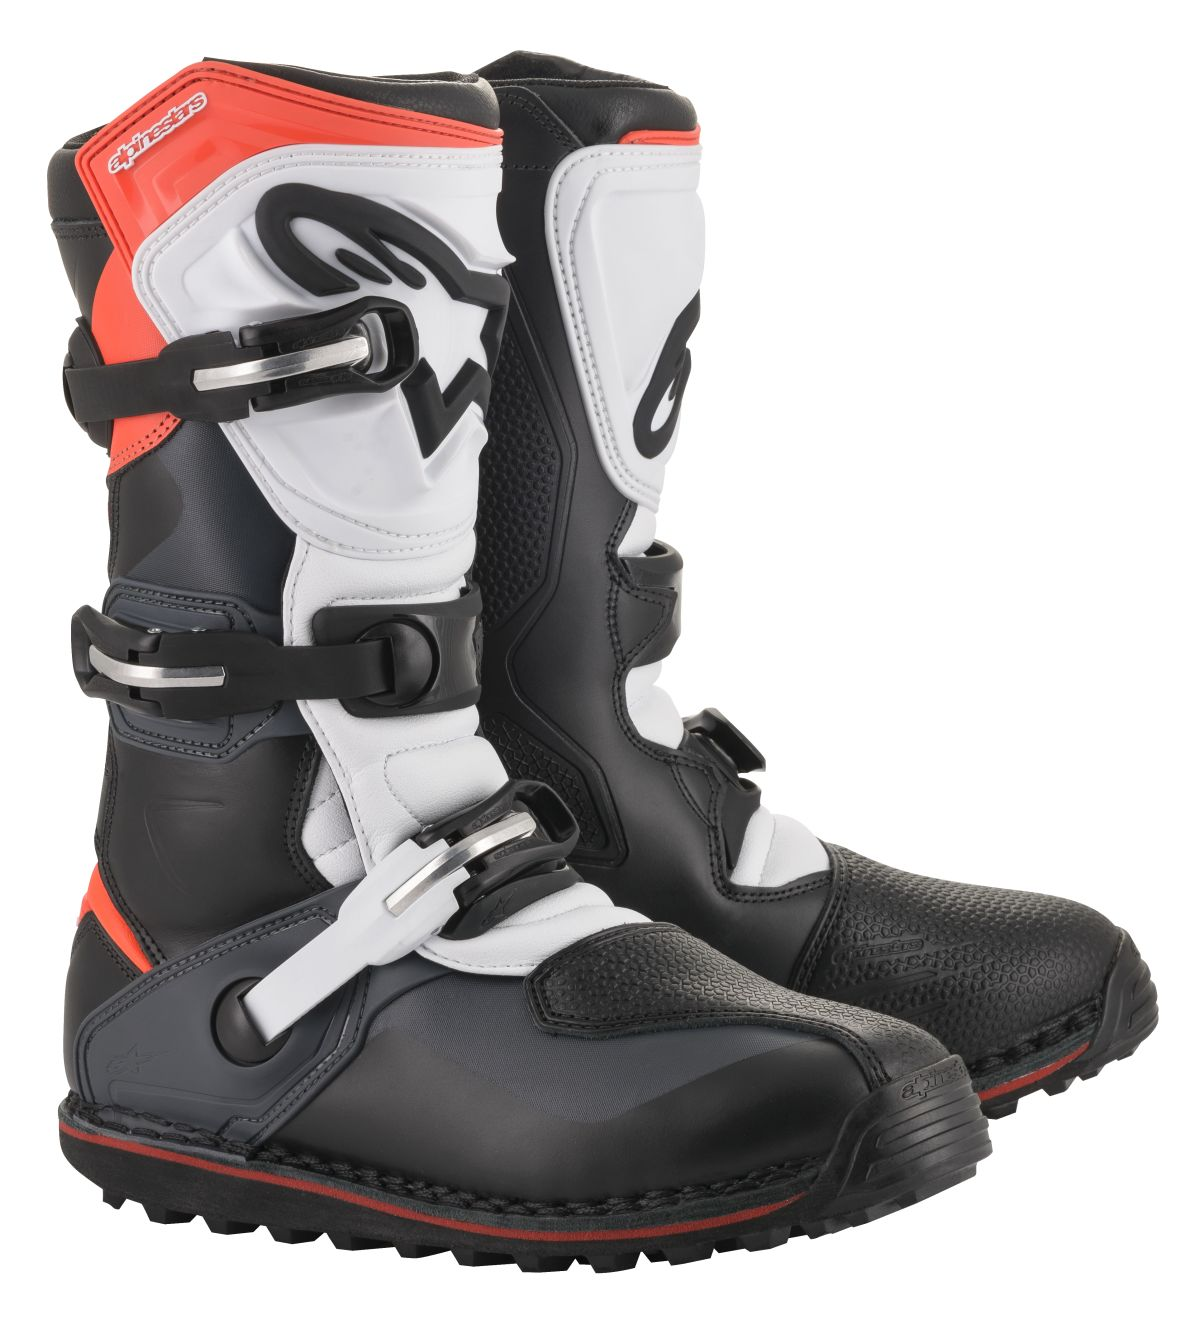 Alpinestars Enduro Laarzen TECH-T BK/GY/RD 10